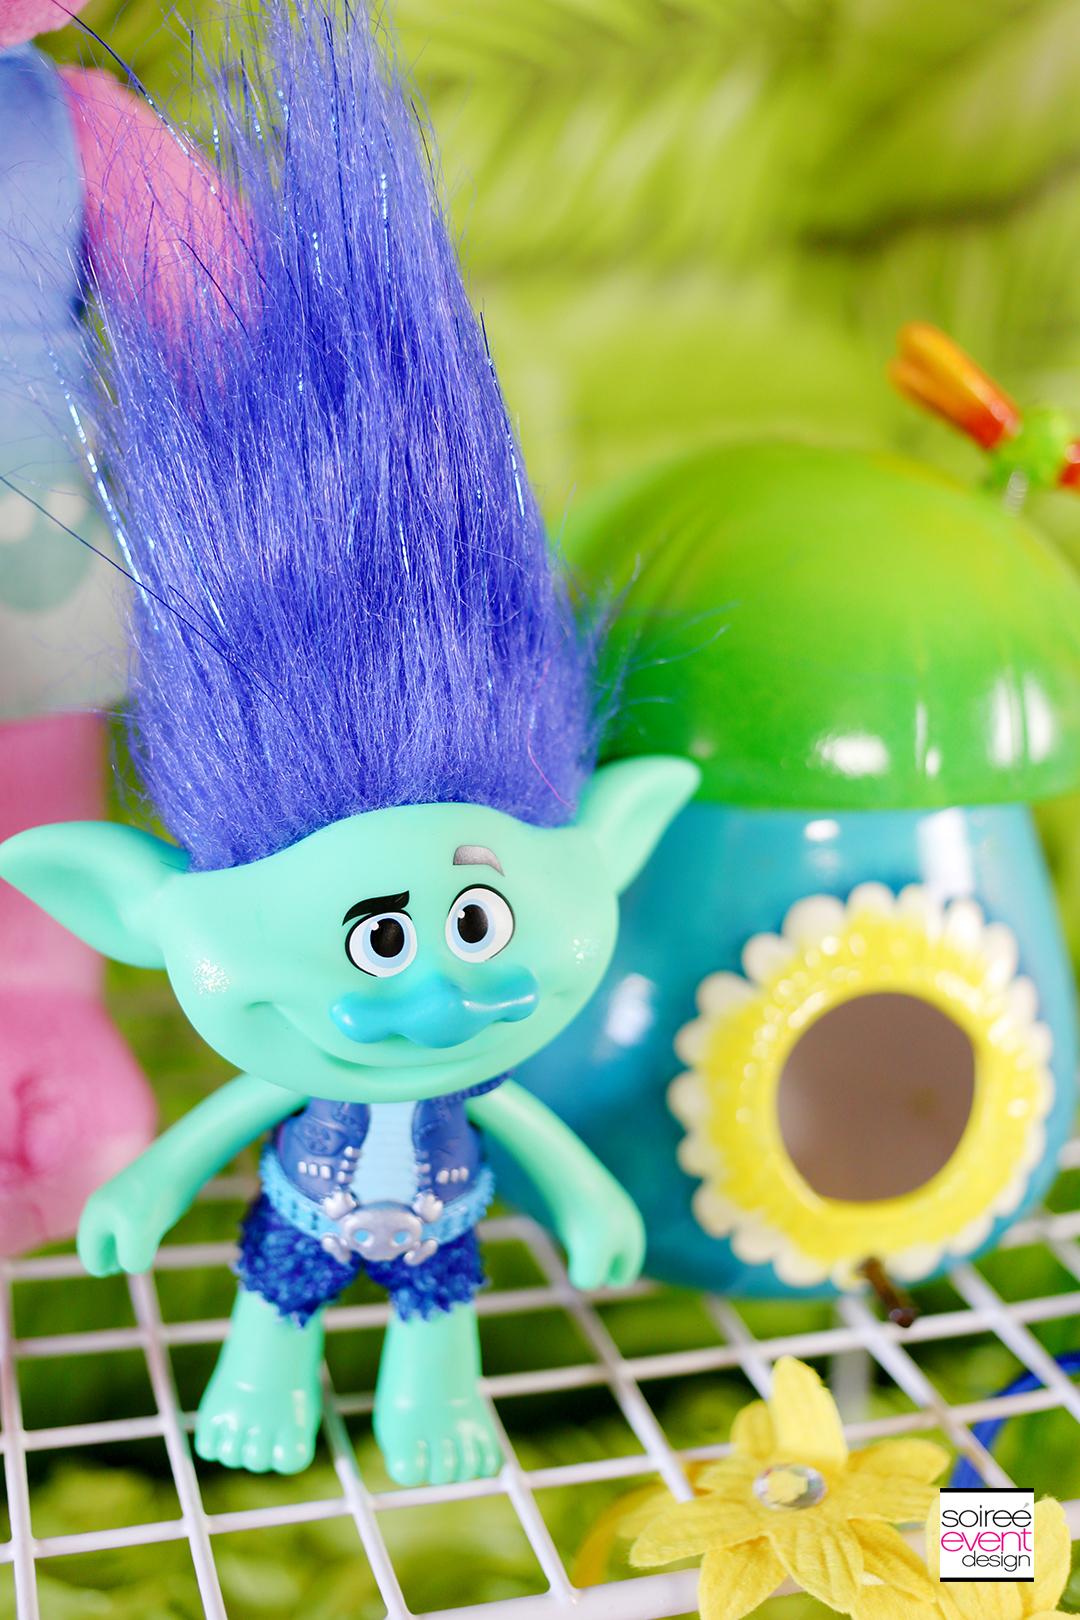 Trolls party ideas, Trolls party decorations